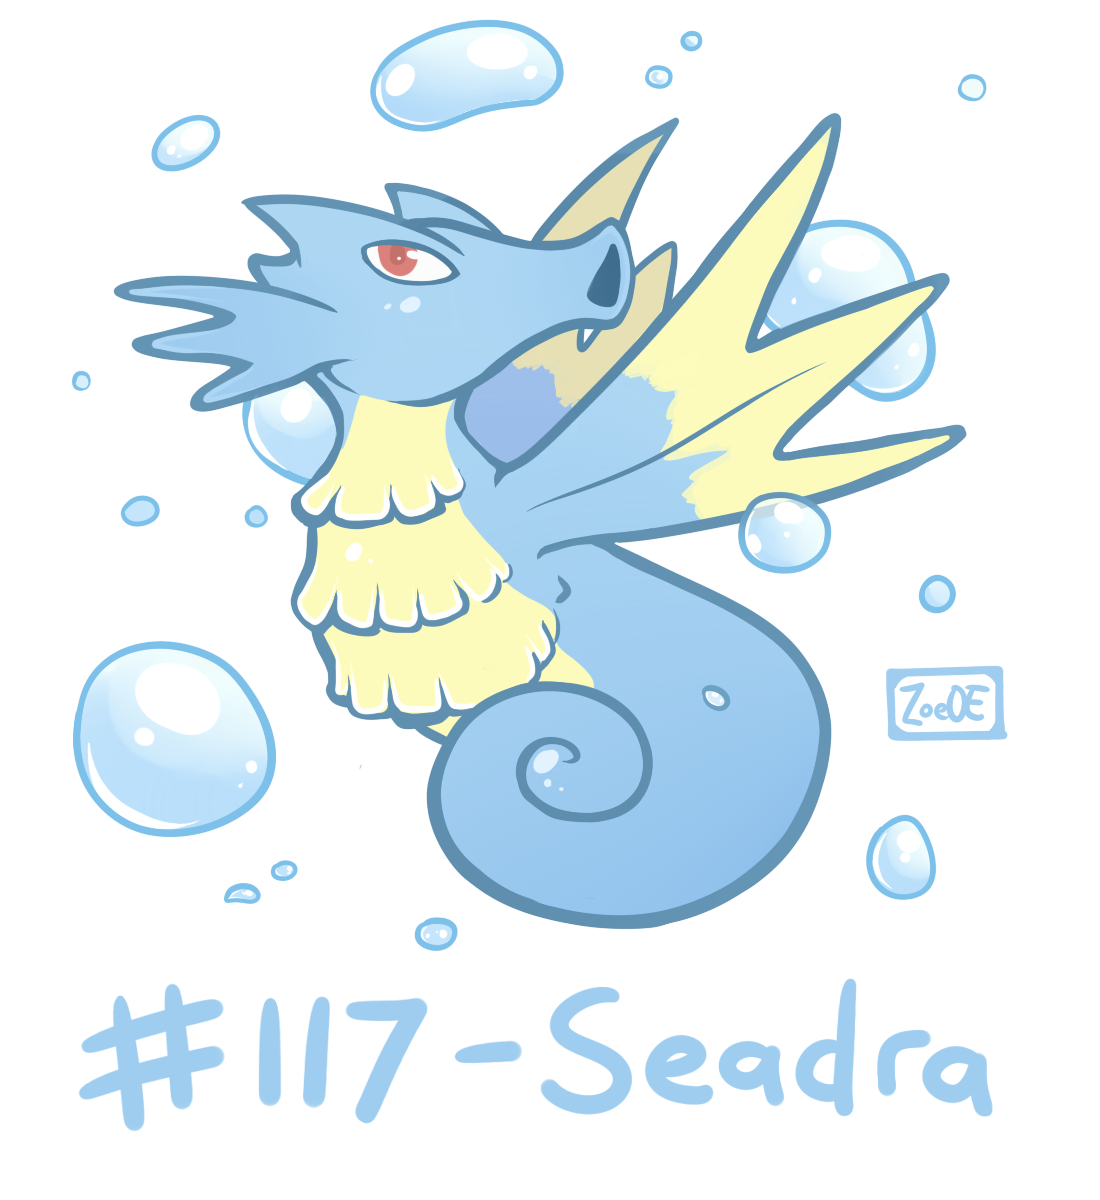 117 Seadra 478352899